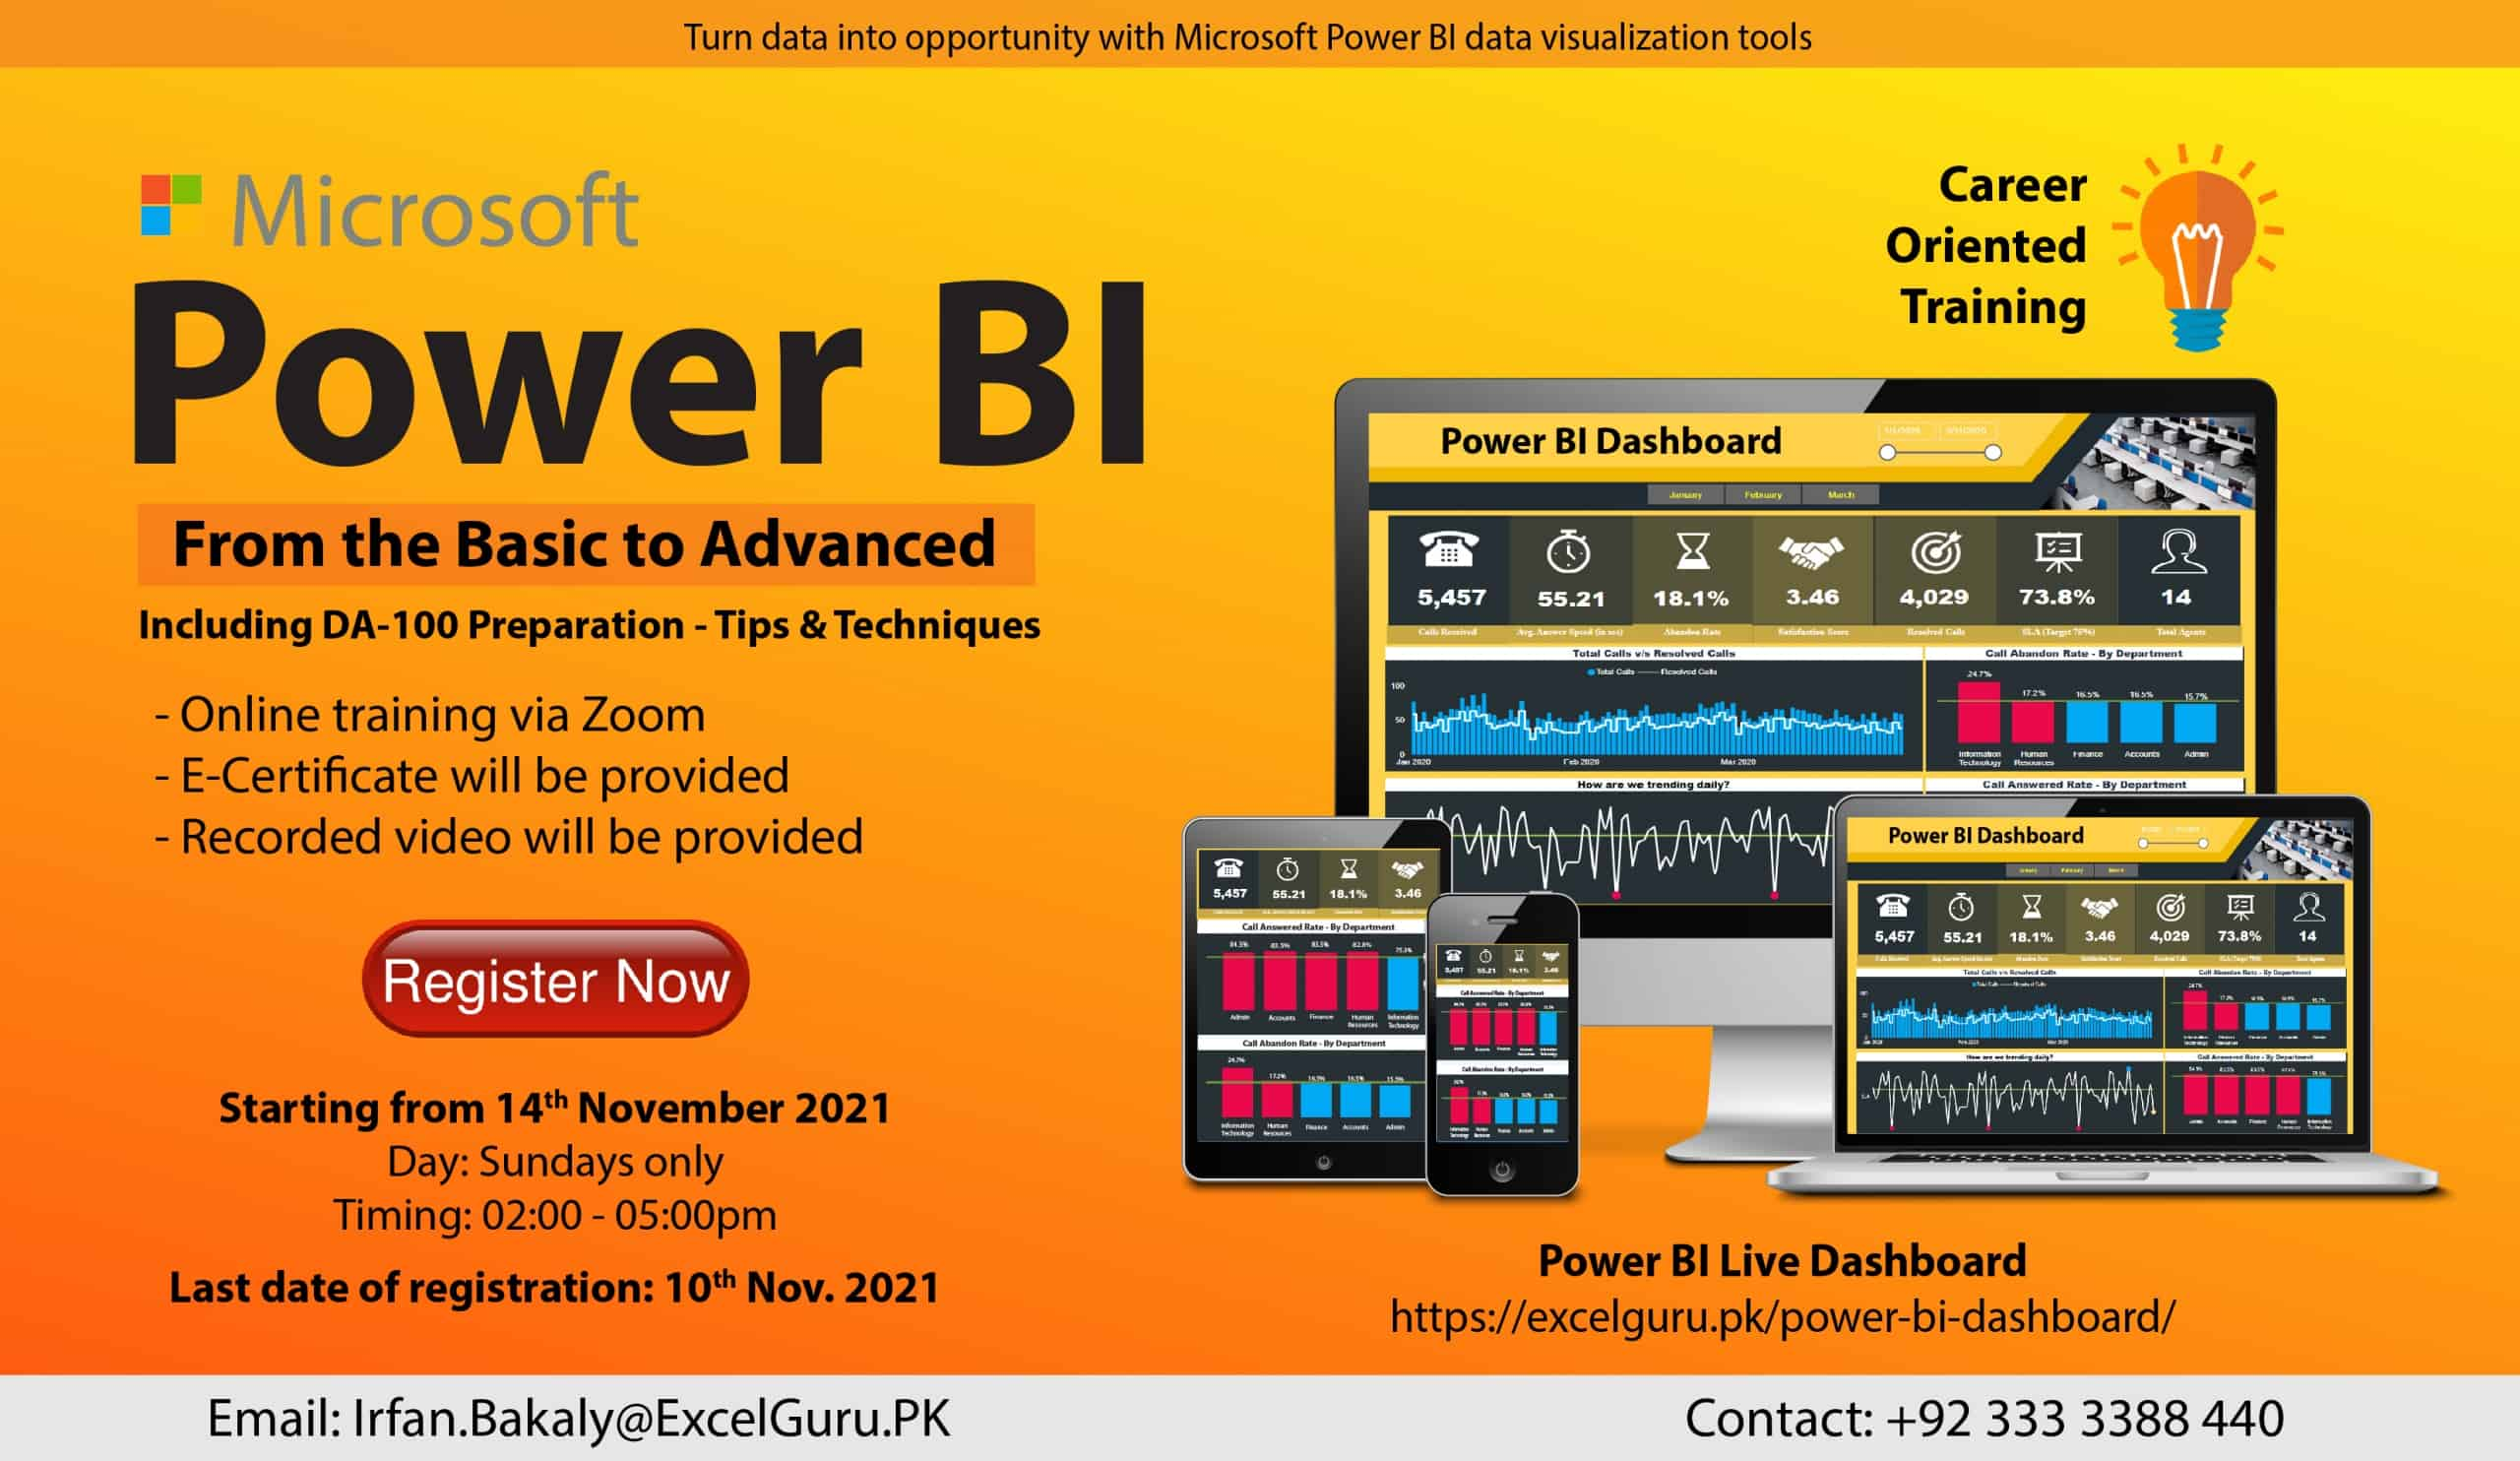 Power BI Training Nov-Dec 2021